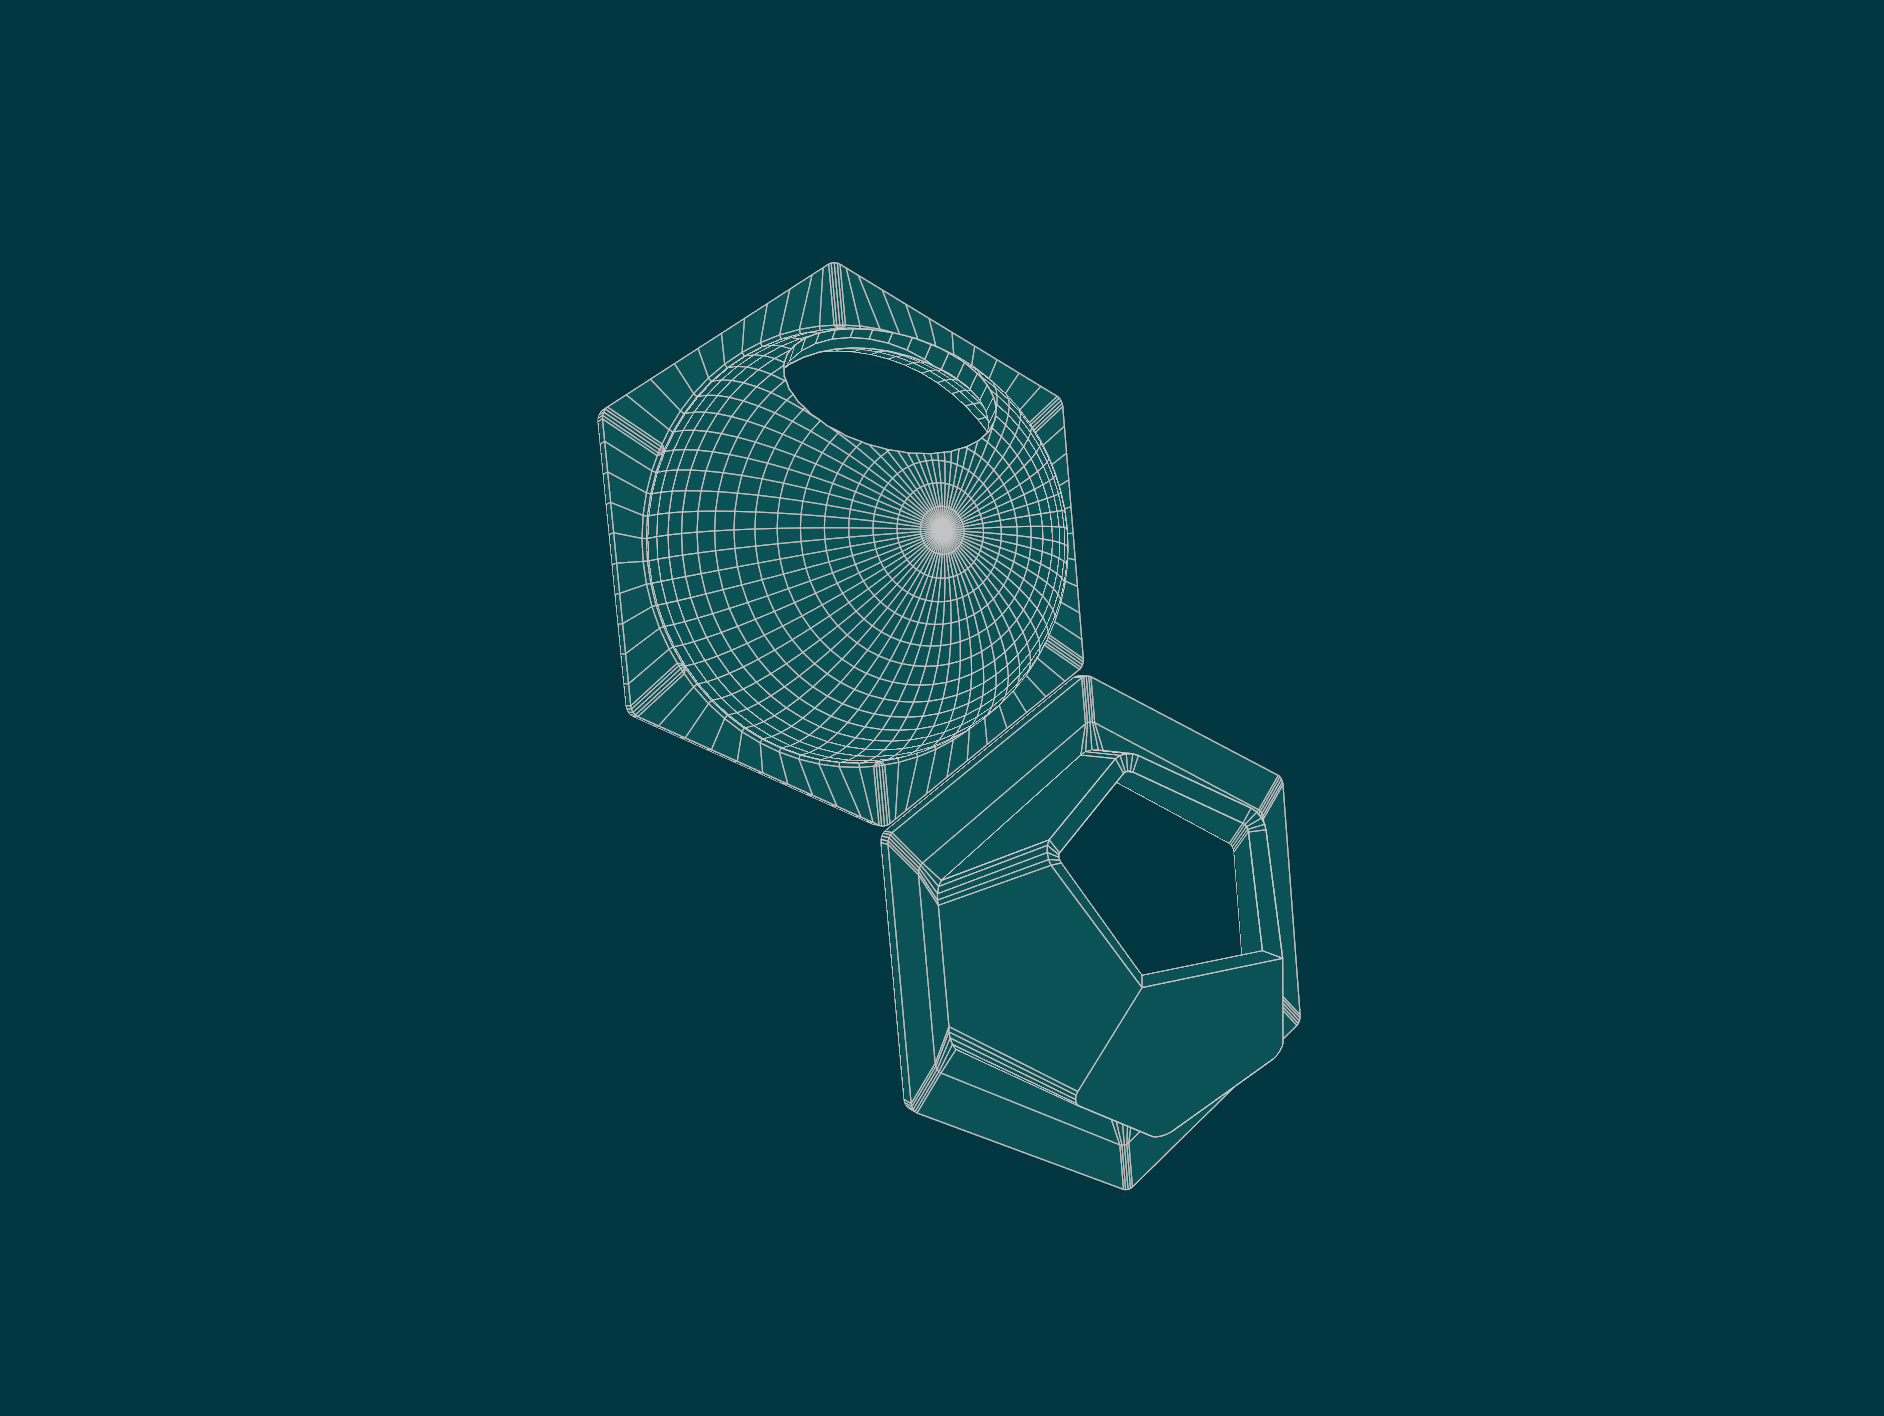 WALL_PLANT_01.png Download free STL file Wall Plantations • 3D printing object, JosephKerr